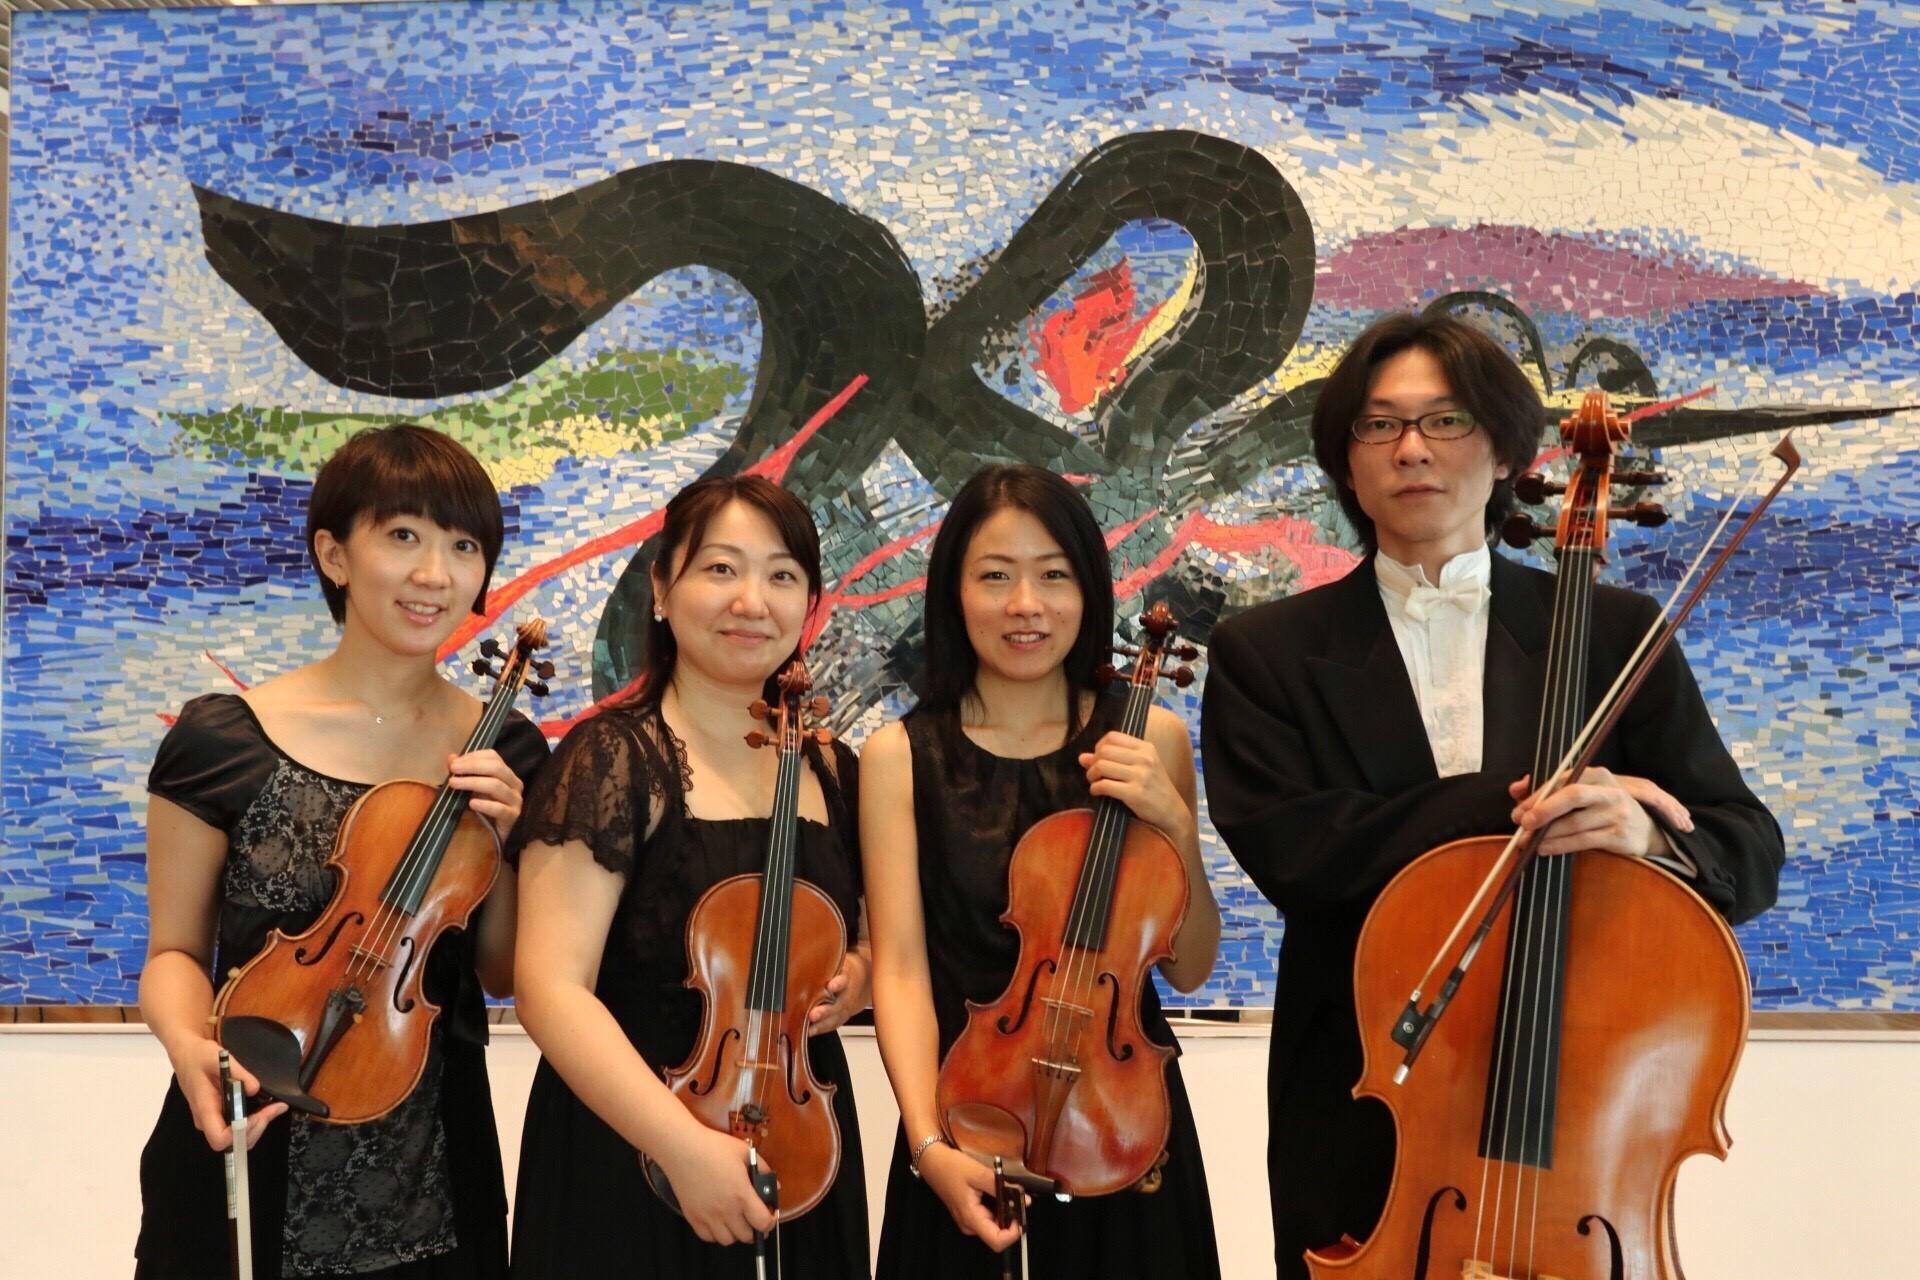 【2017/02/26】Quartet SISLEY Taro バースデーコンサート@岡本太郎美術館